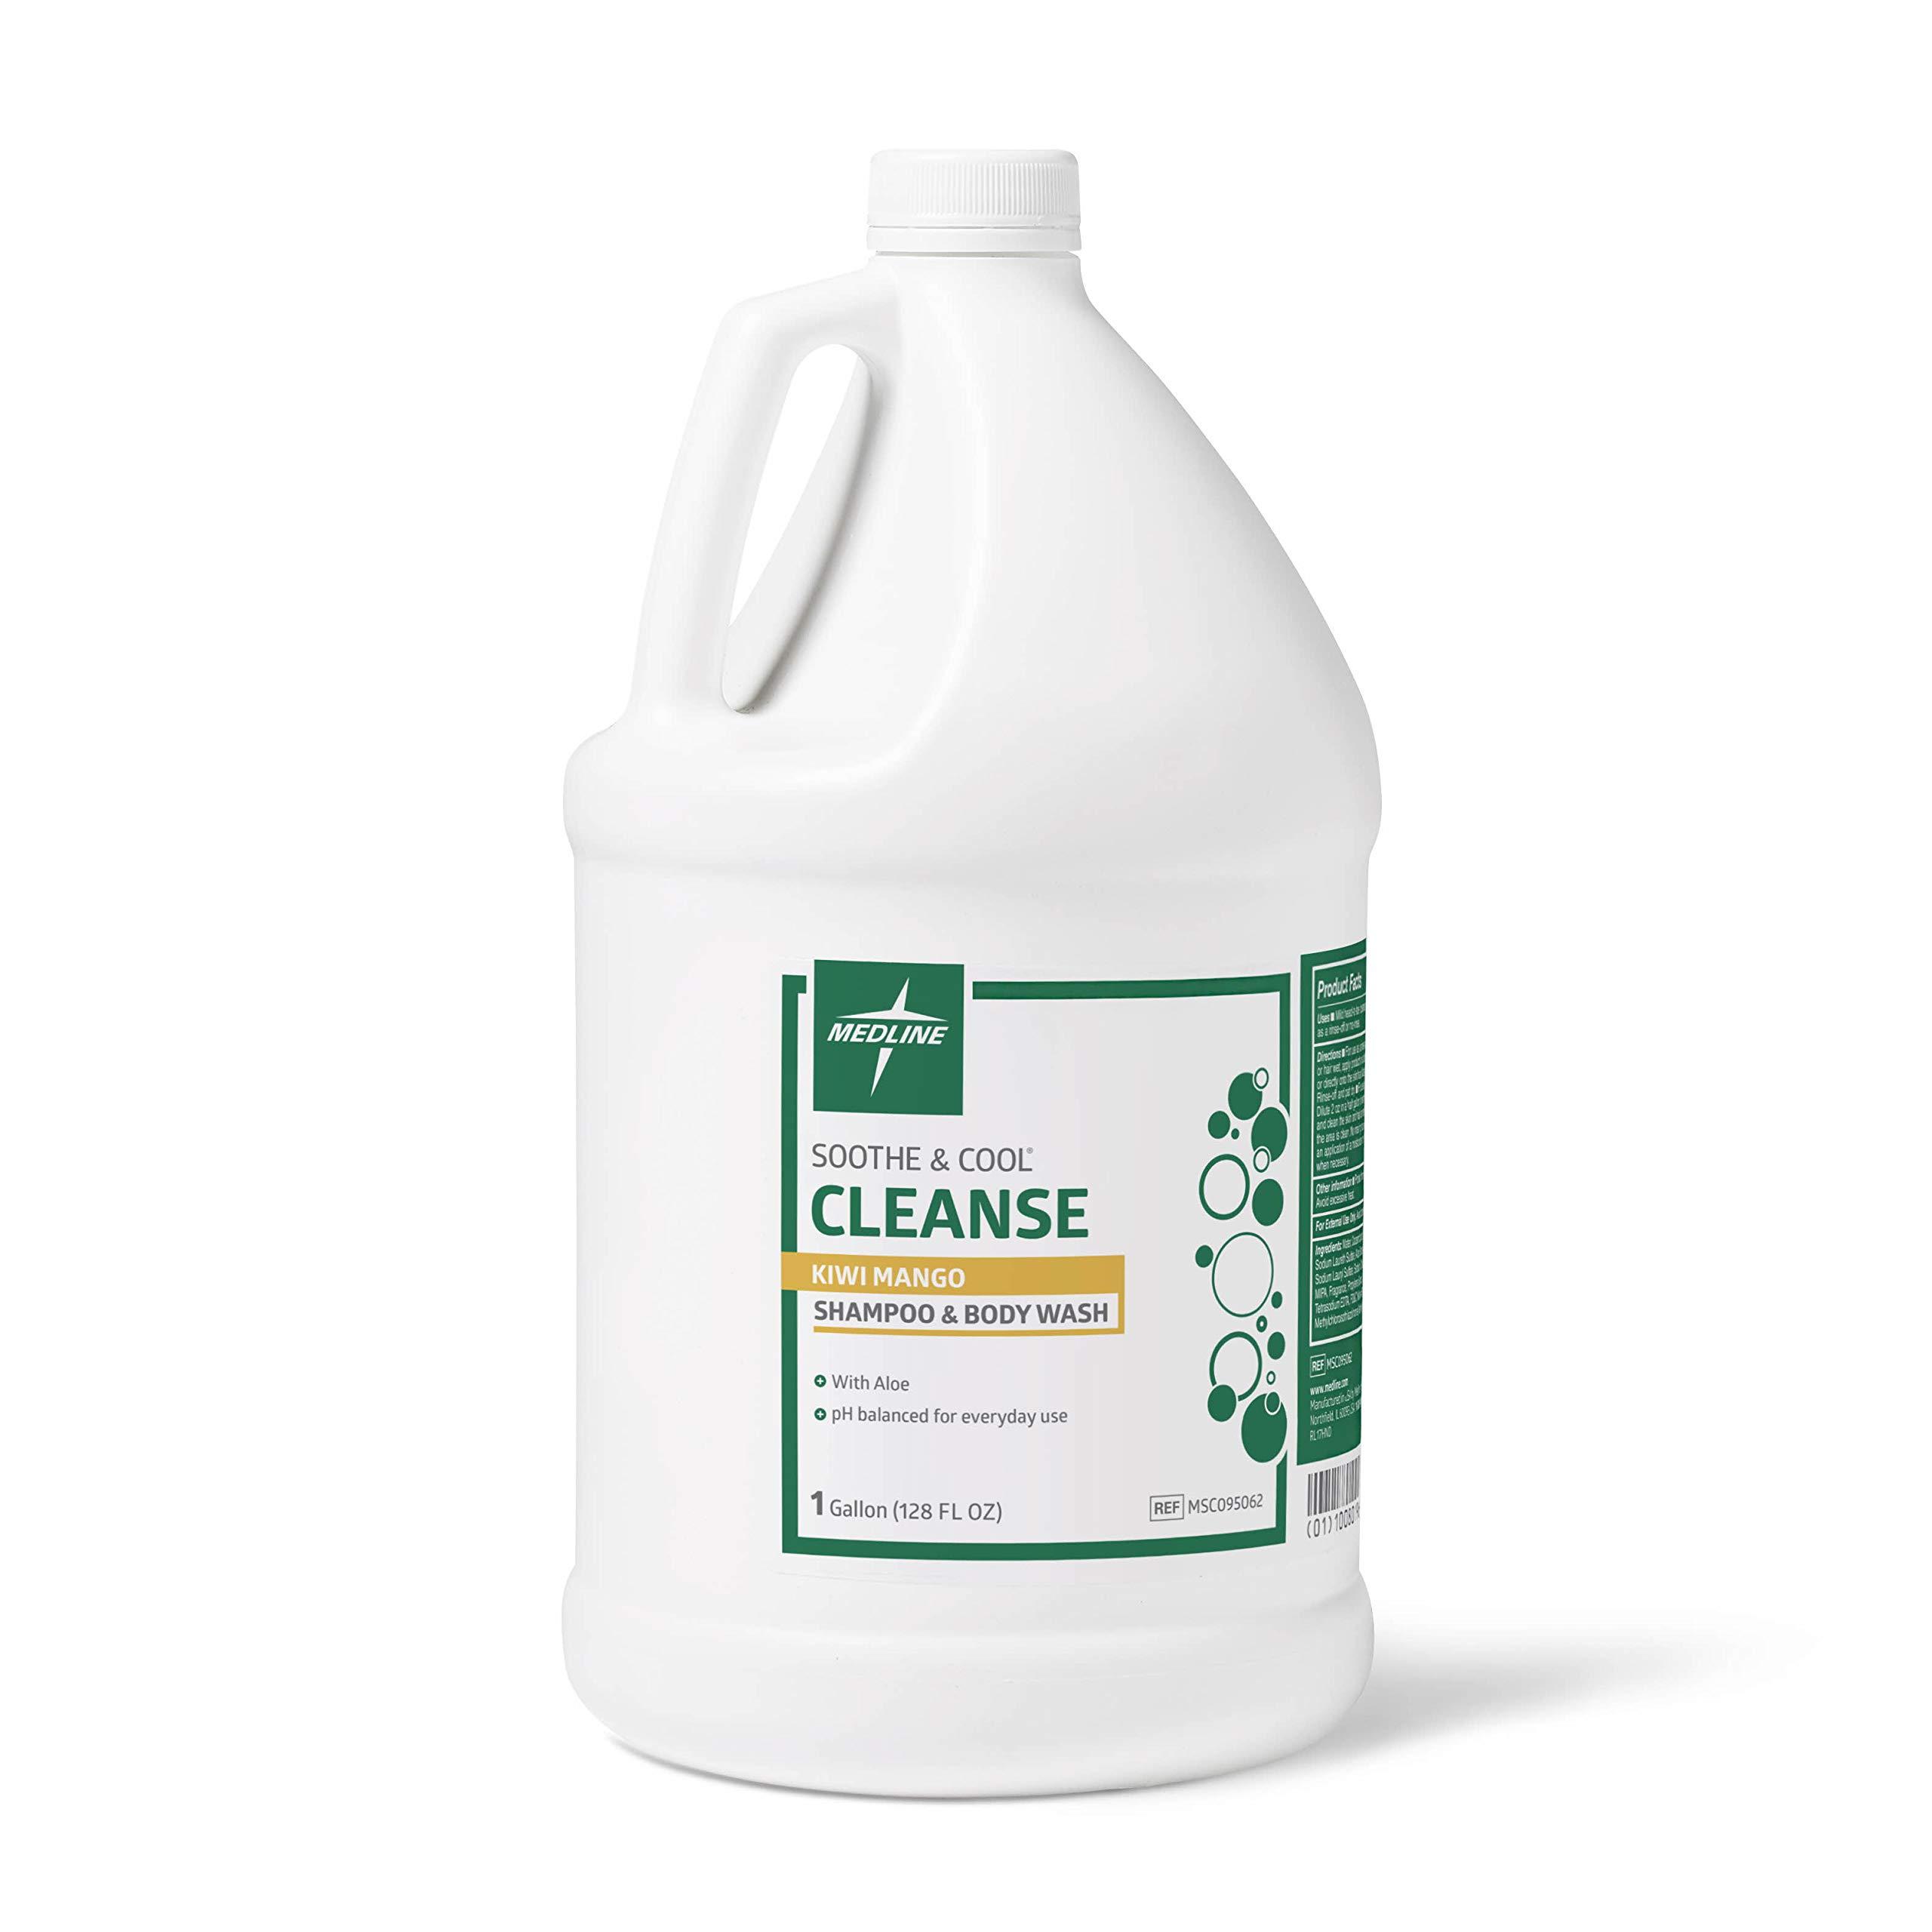 Medline MSC095062 Fragranced Shampoo and Body Wash, Kiwi Mango Scent, 128 oz (Pack of 4)